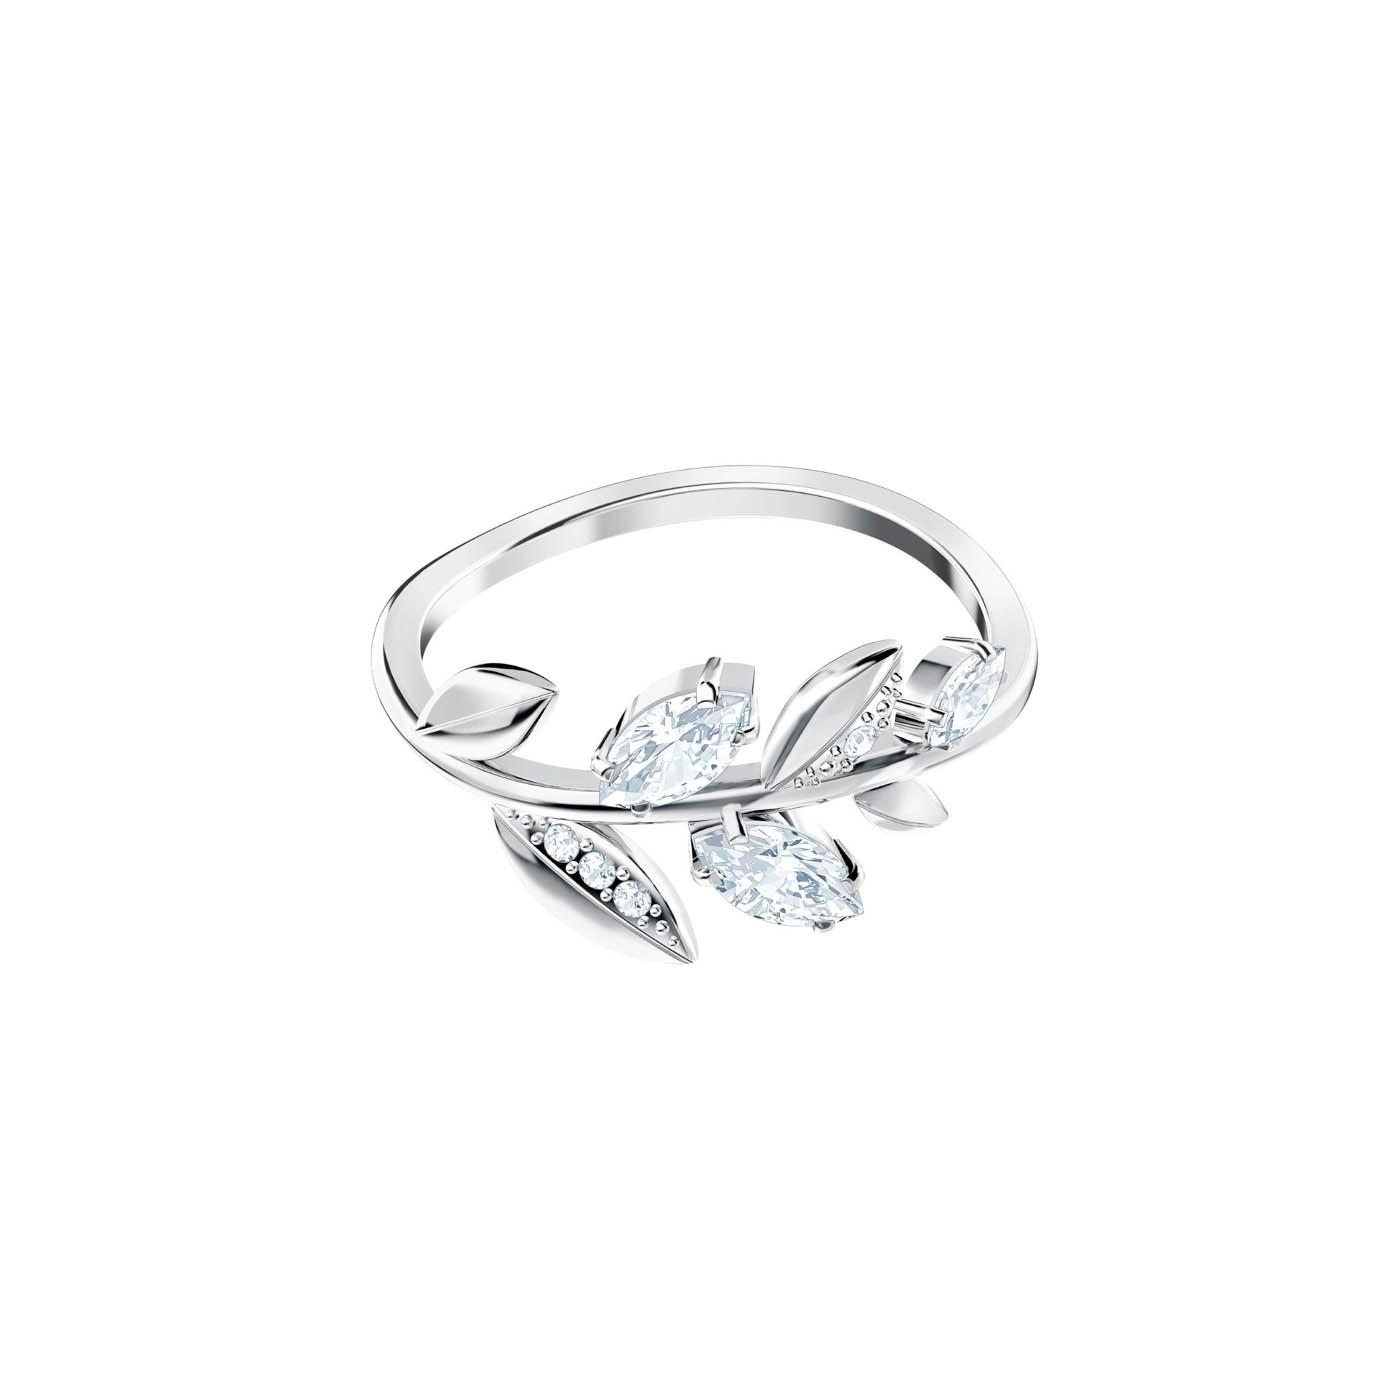 30a646f2a5c7e Swarovski Mayfly White Ring - Jewelry